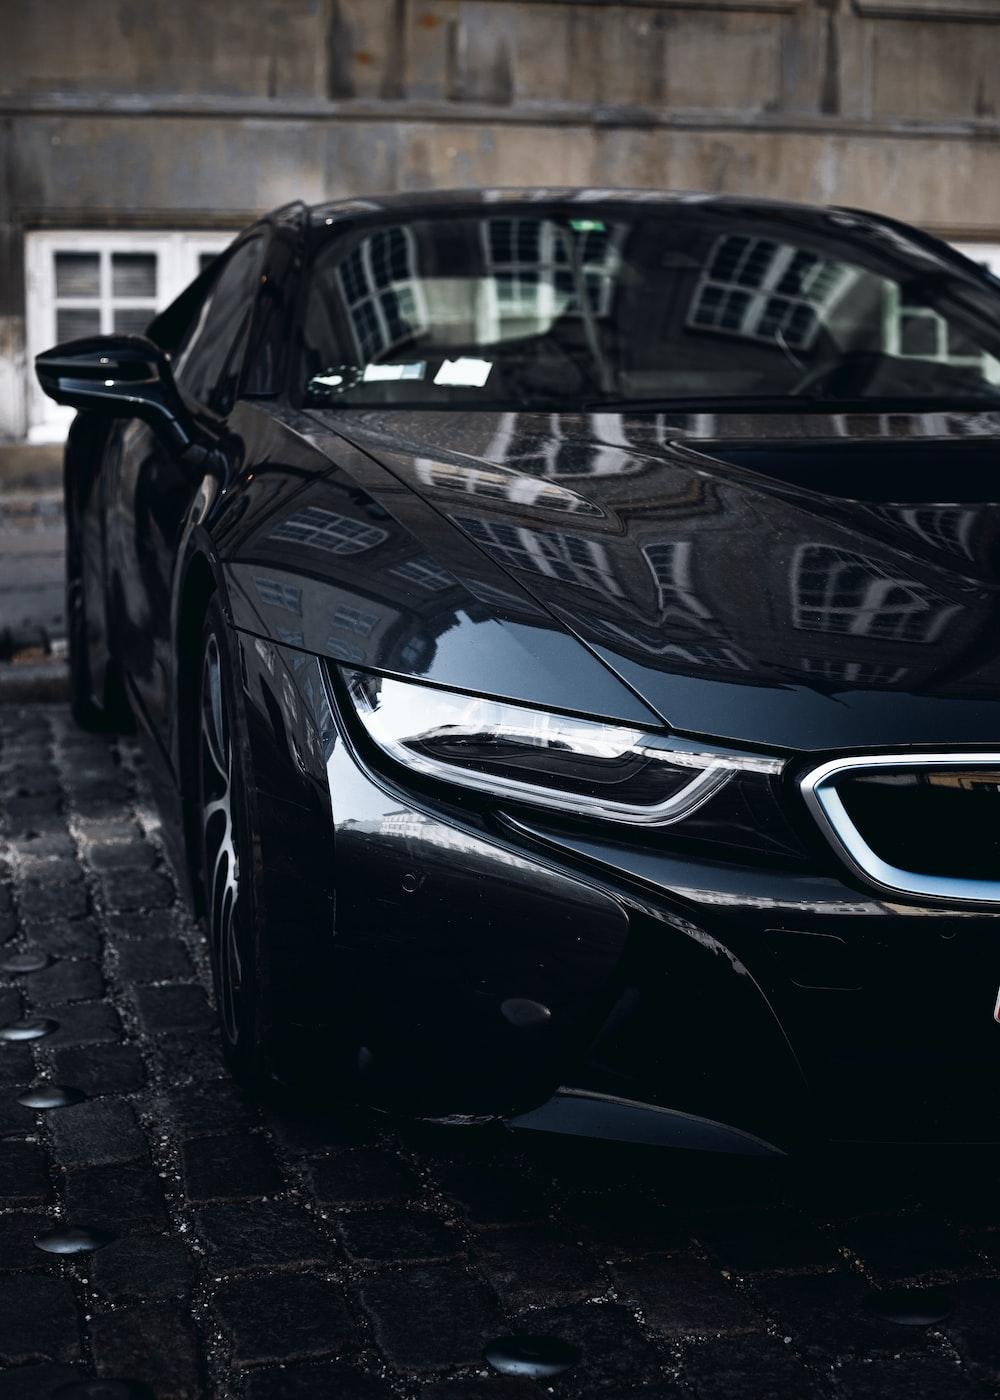 black car parked on gray brick floor